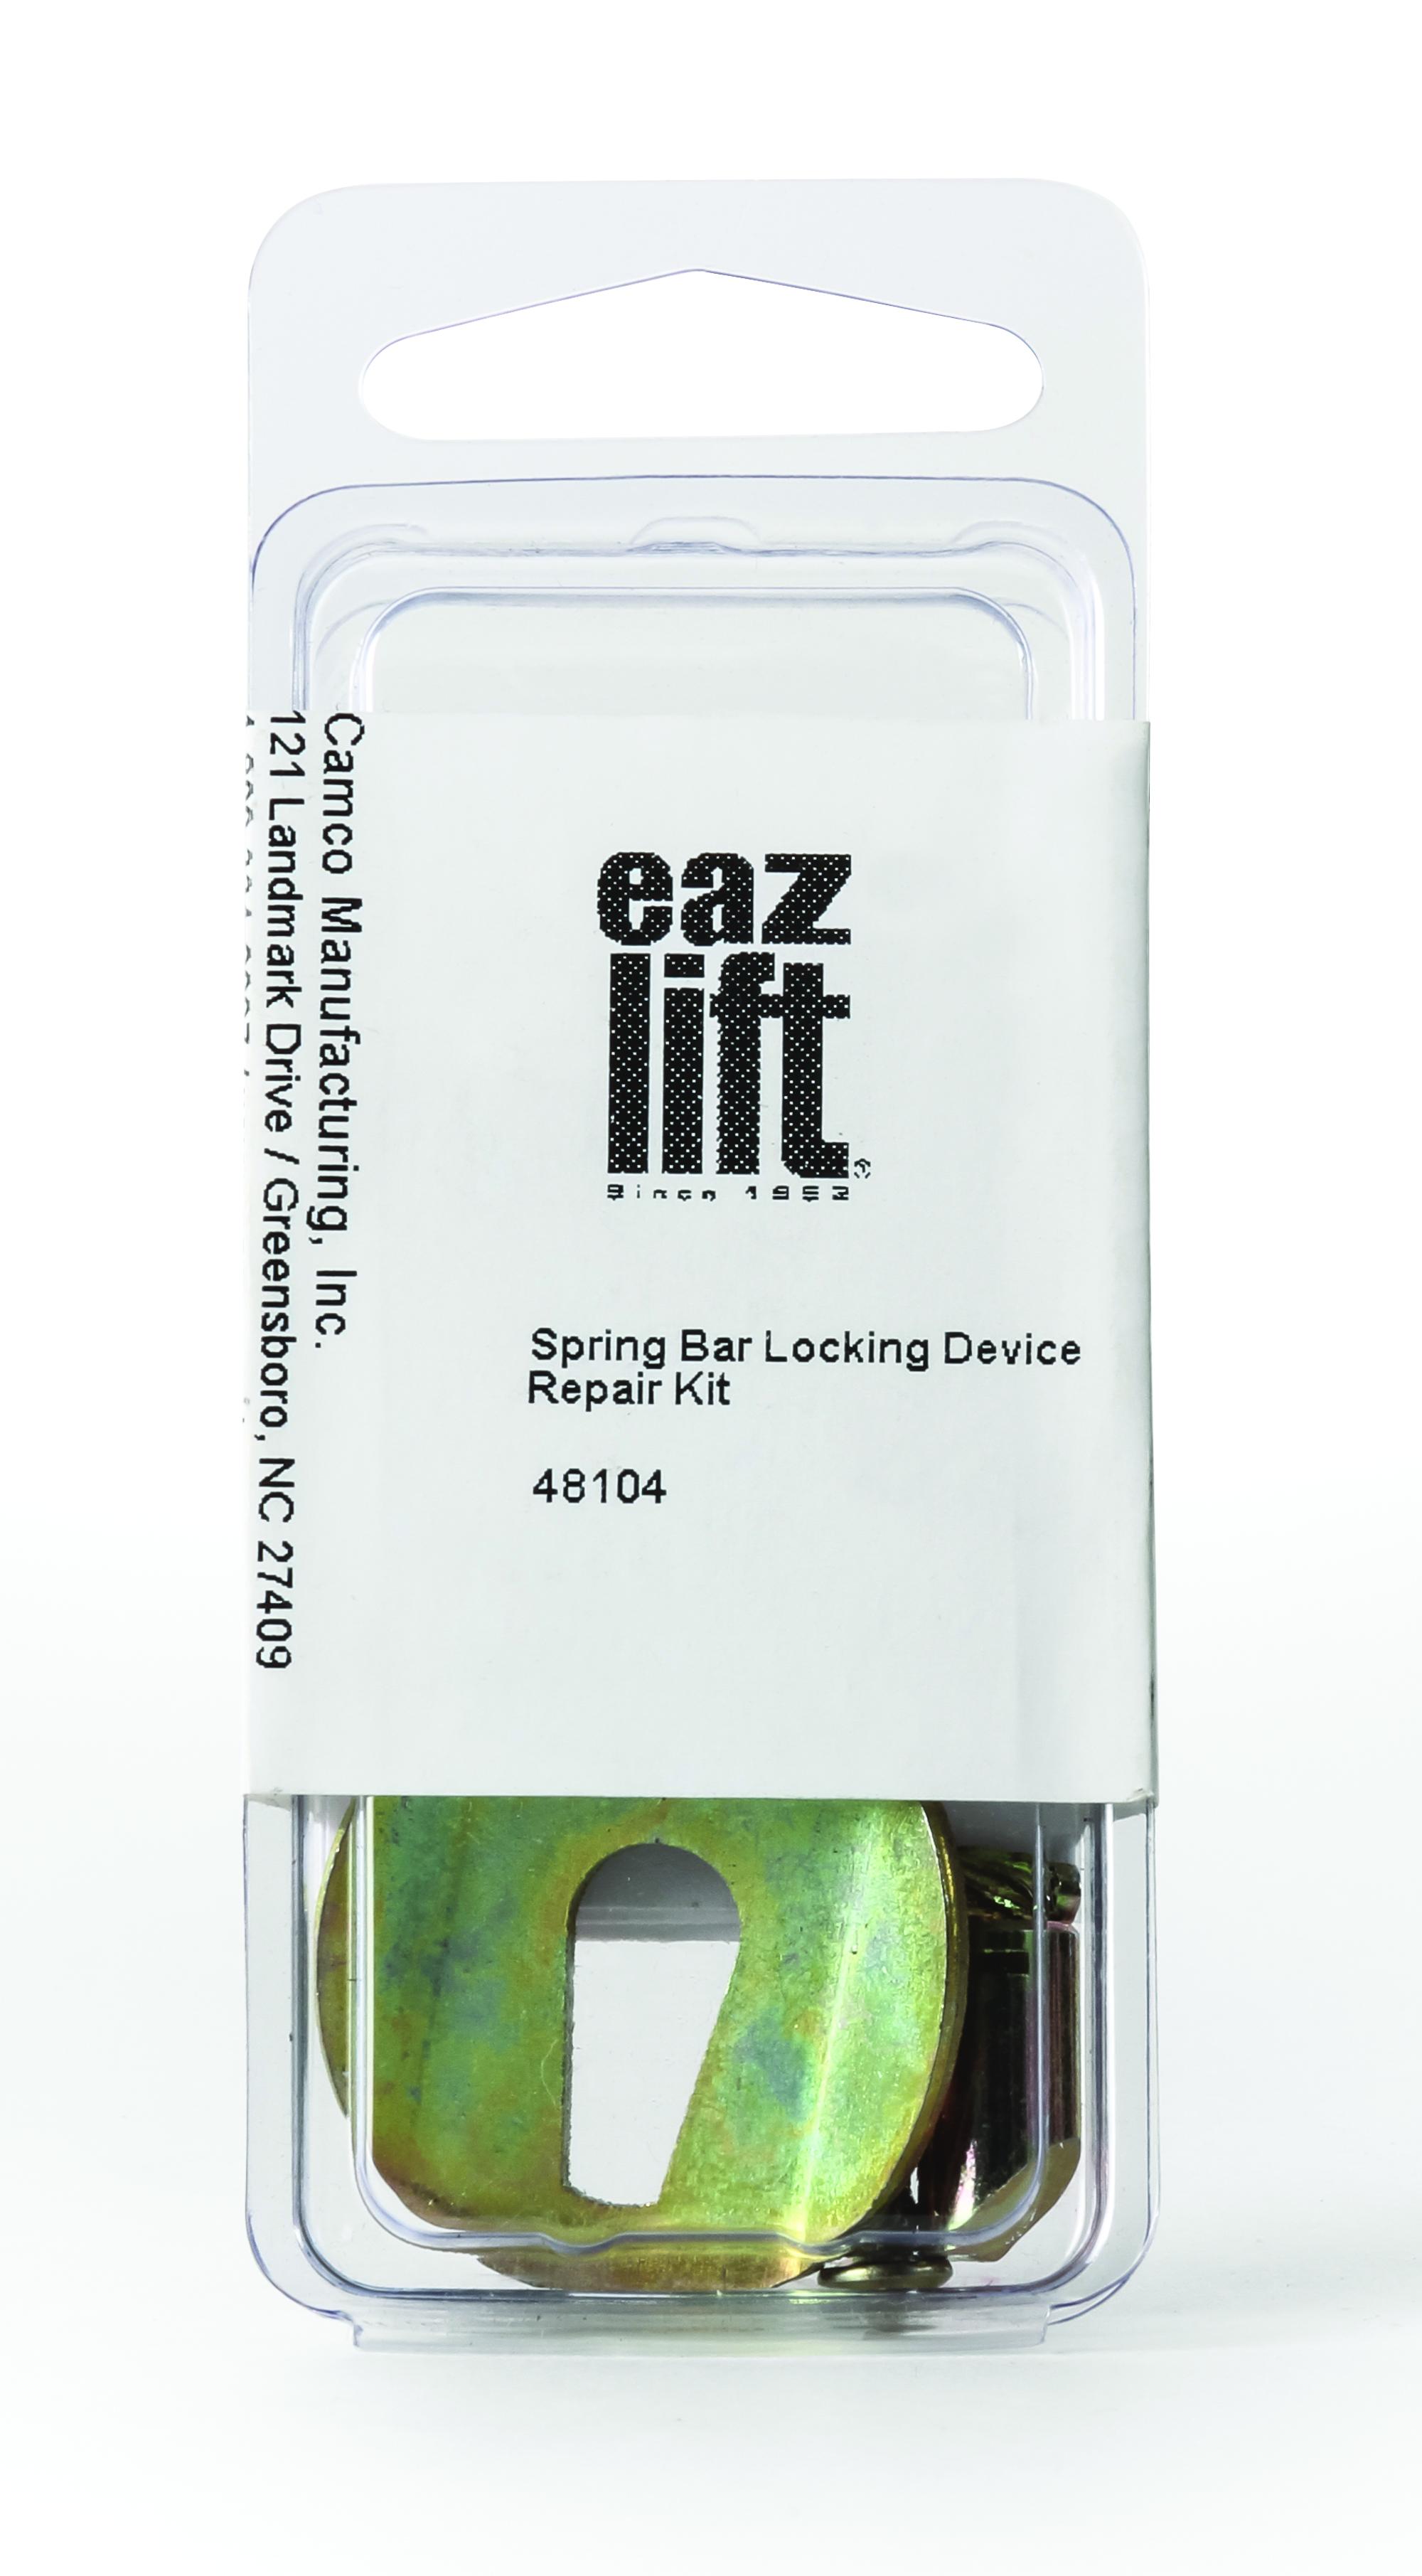 Eaz-Lift 48104 Spring Bar Locking Device Repair Kit